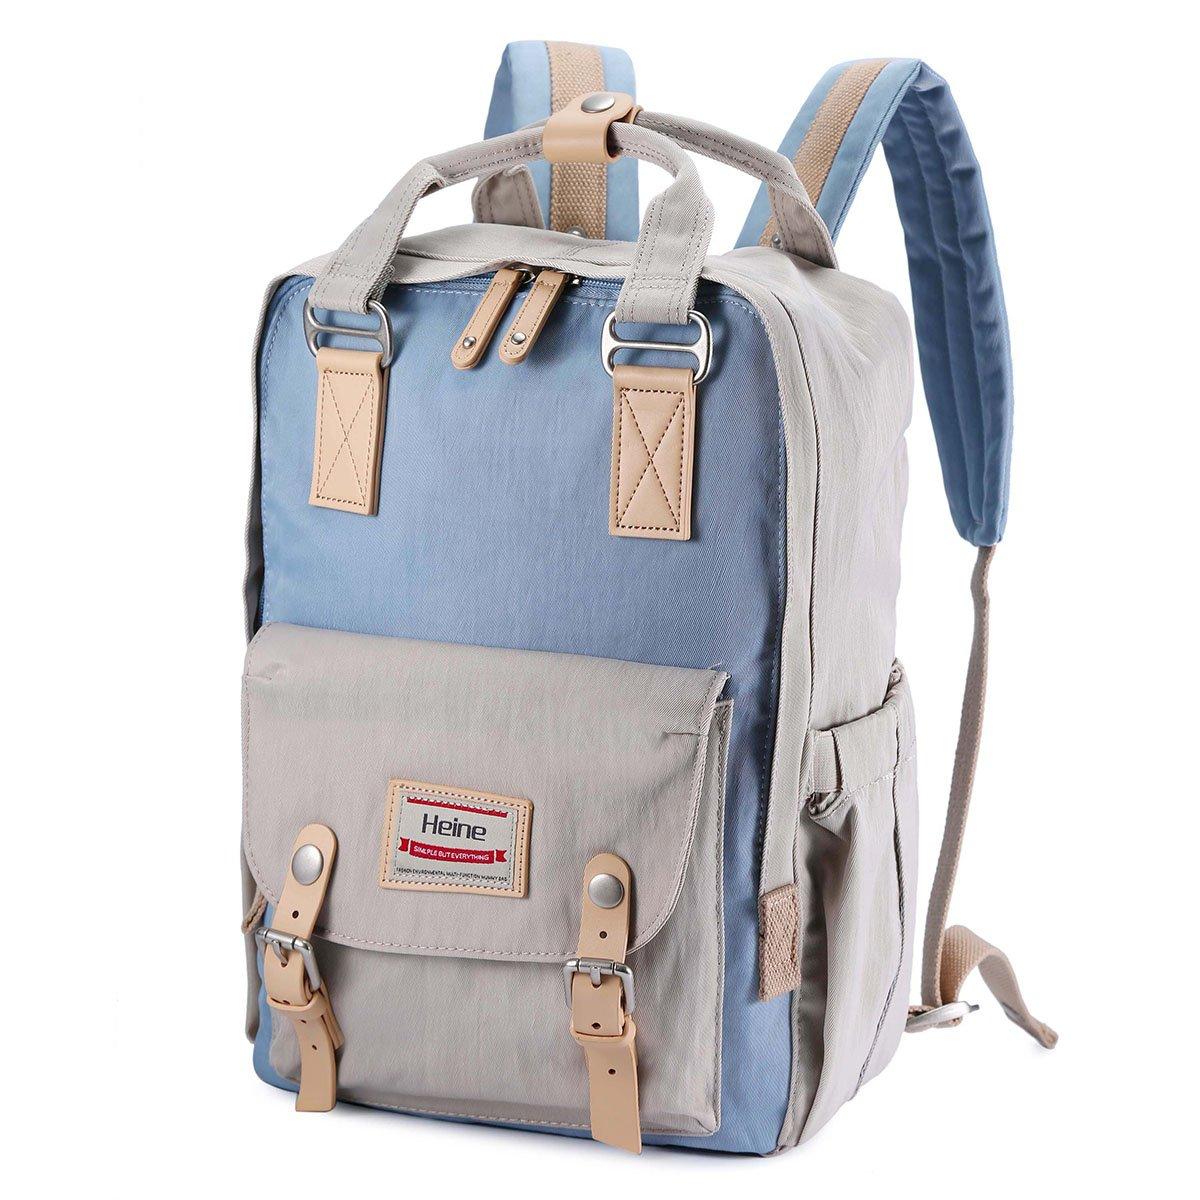 Diaper Bag Baby Bag Mother bag Travel Backpack Quality Diaper Bag Backpack Daypack Multi-Function Waterproof Nappy Bags (Light Gray) Kissfairy